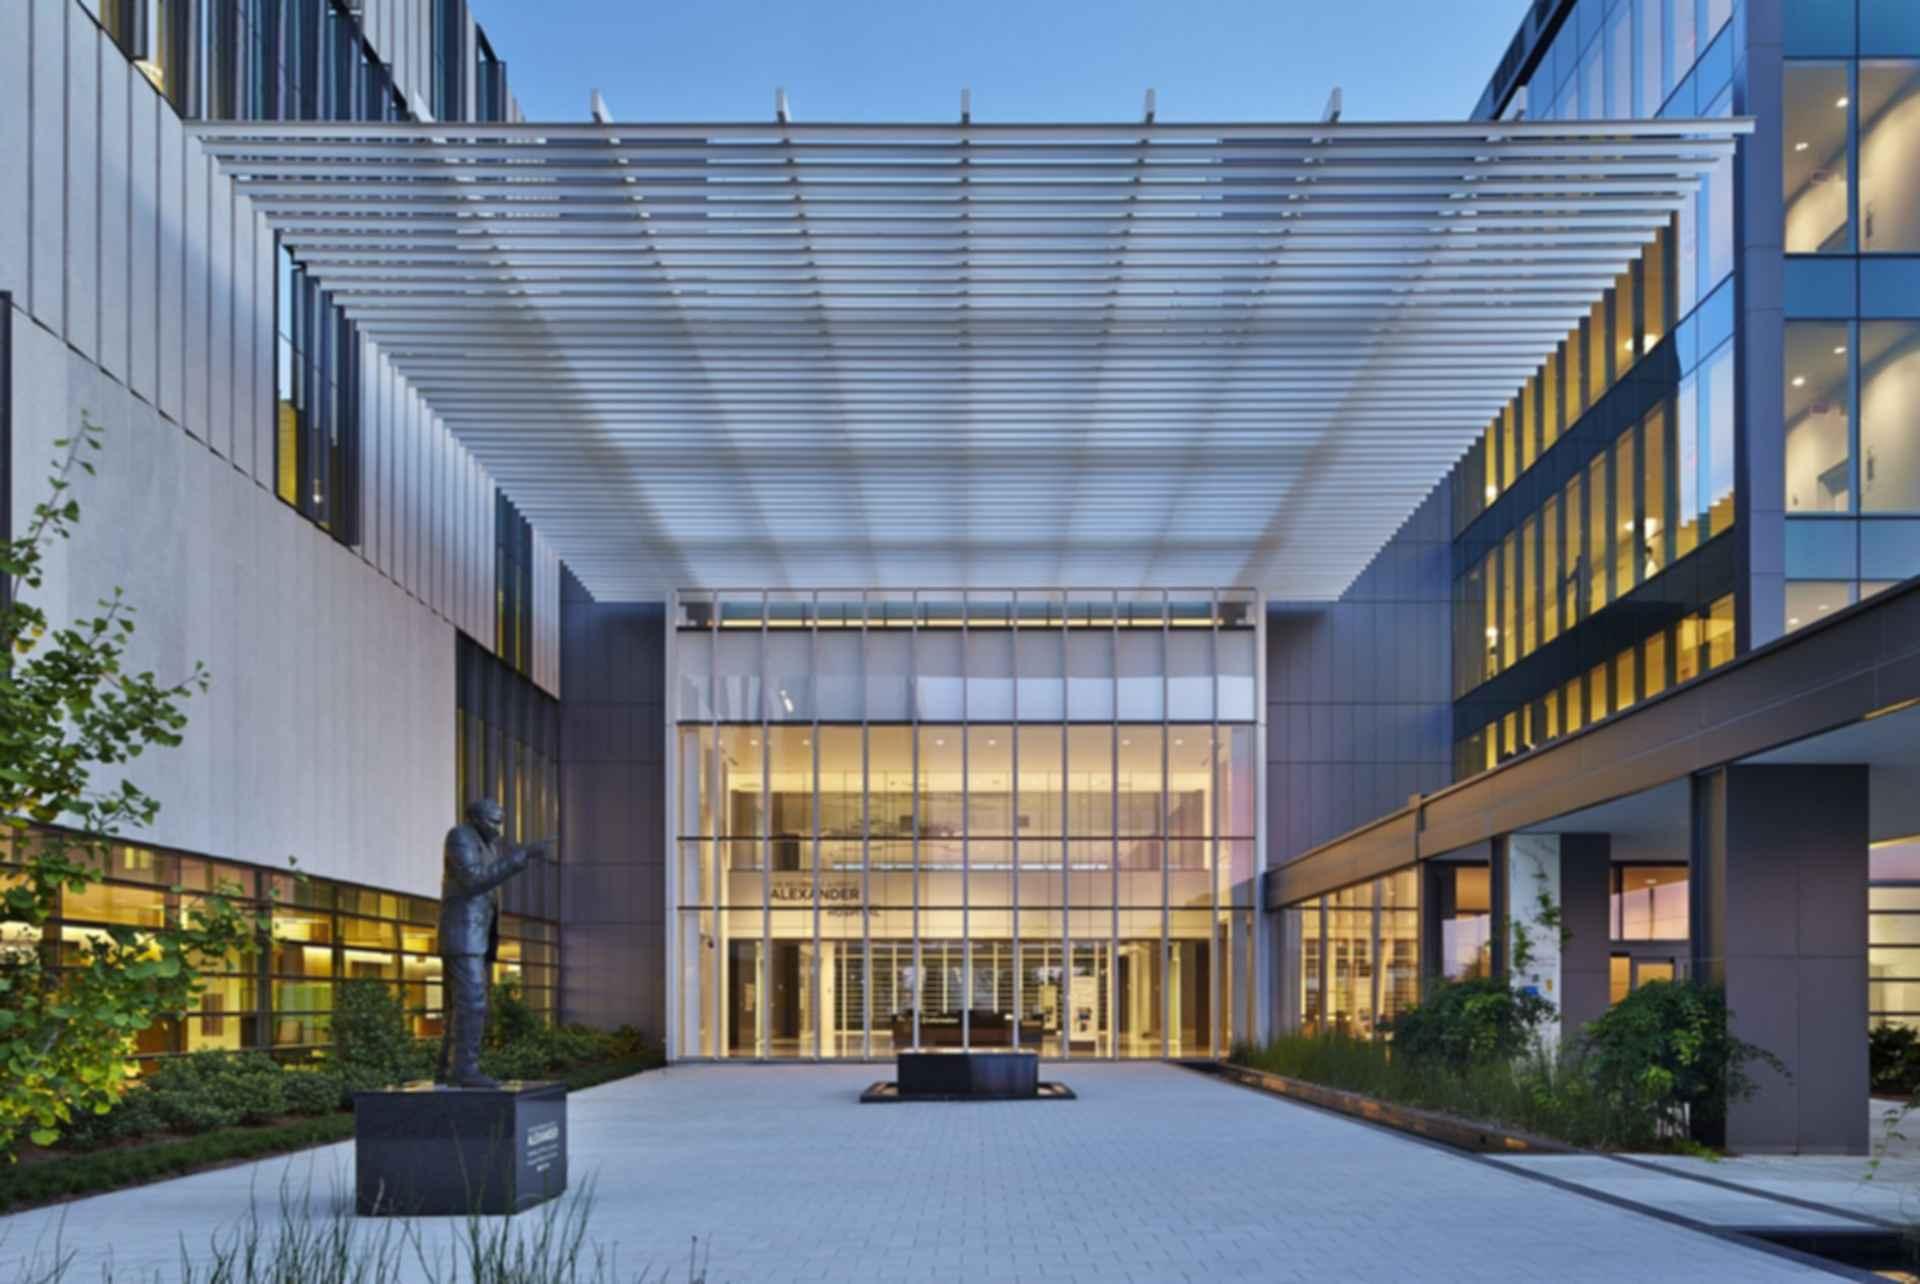 University Medical Center New Orleans - Exterior